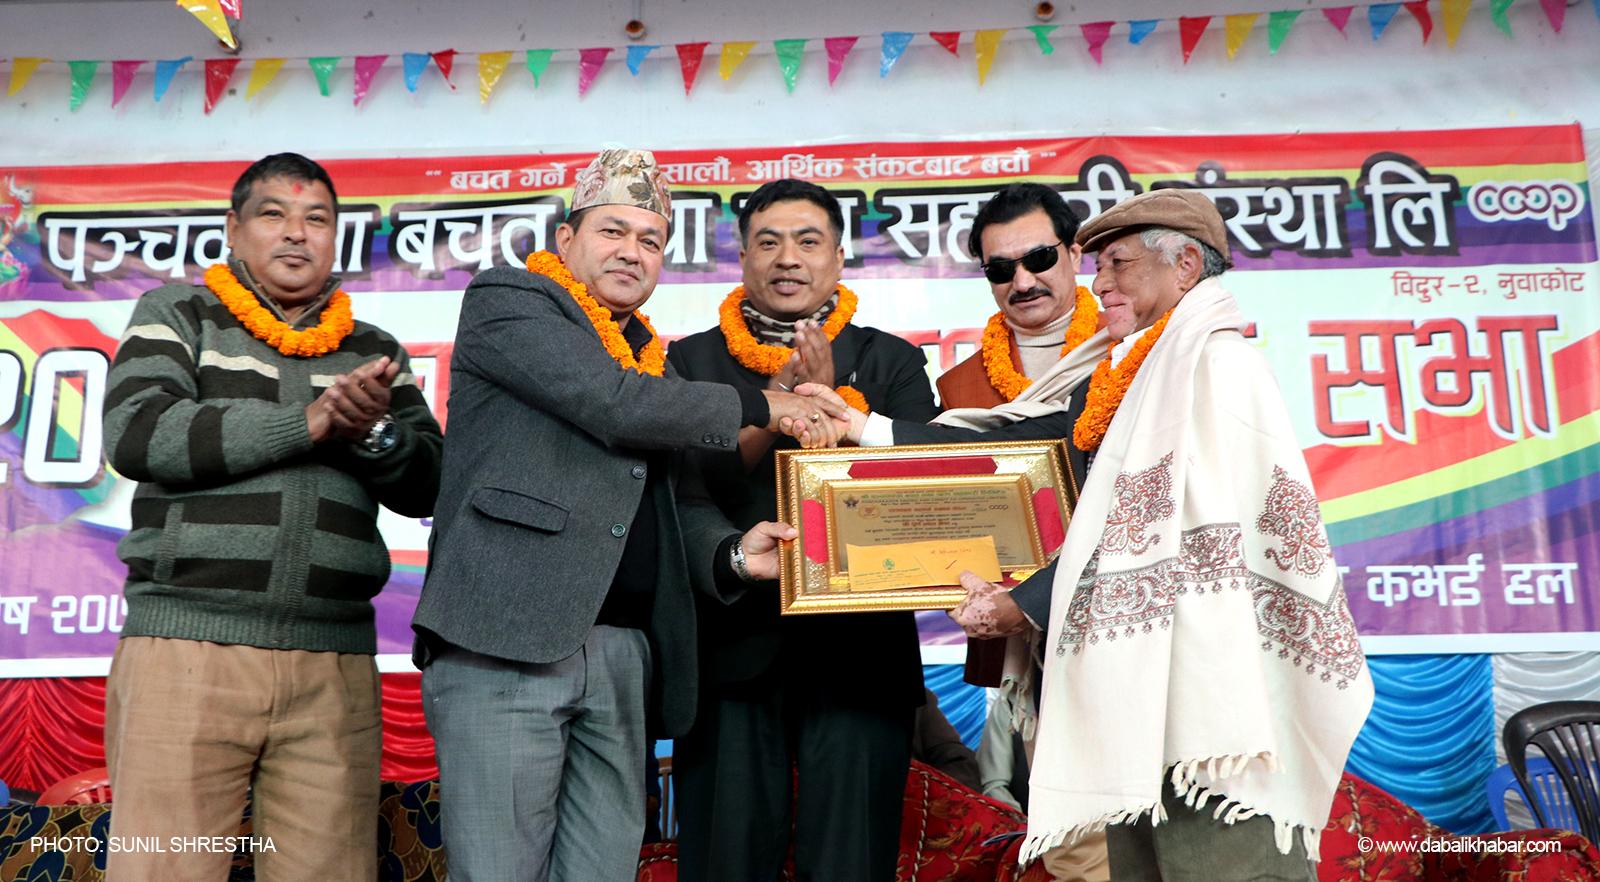 Purna Lal Shrestha Nuwakot Cooperative